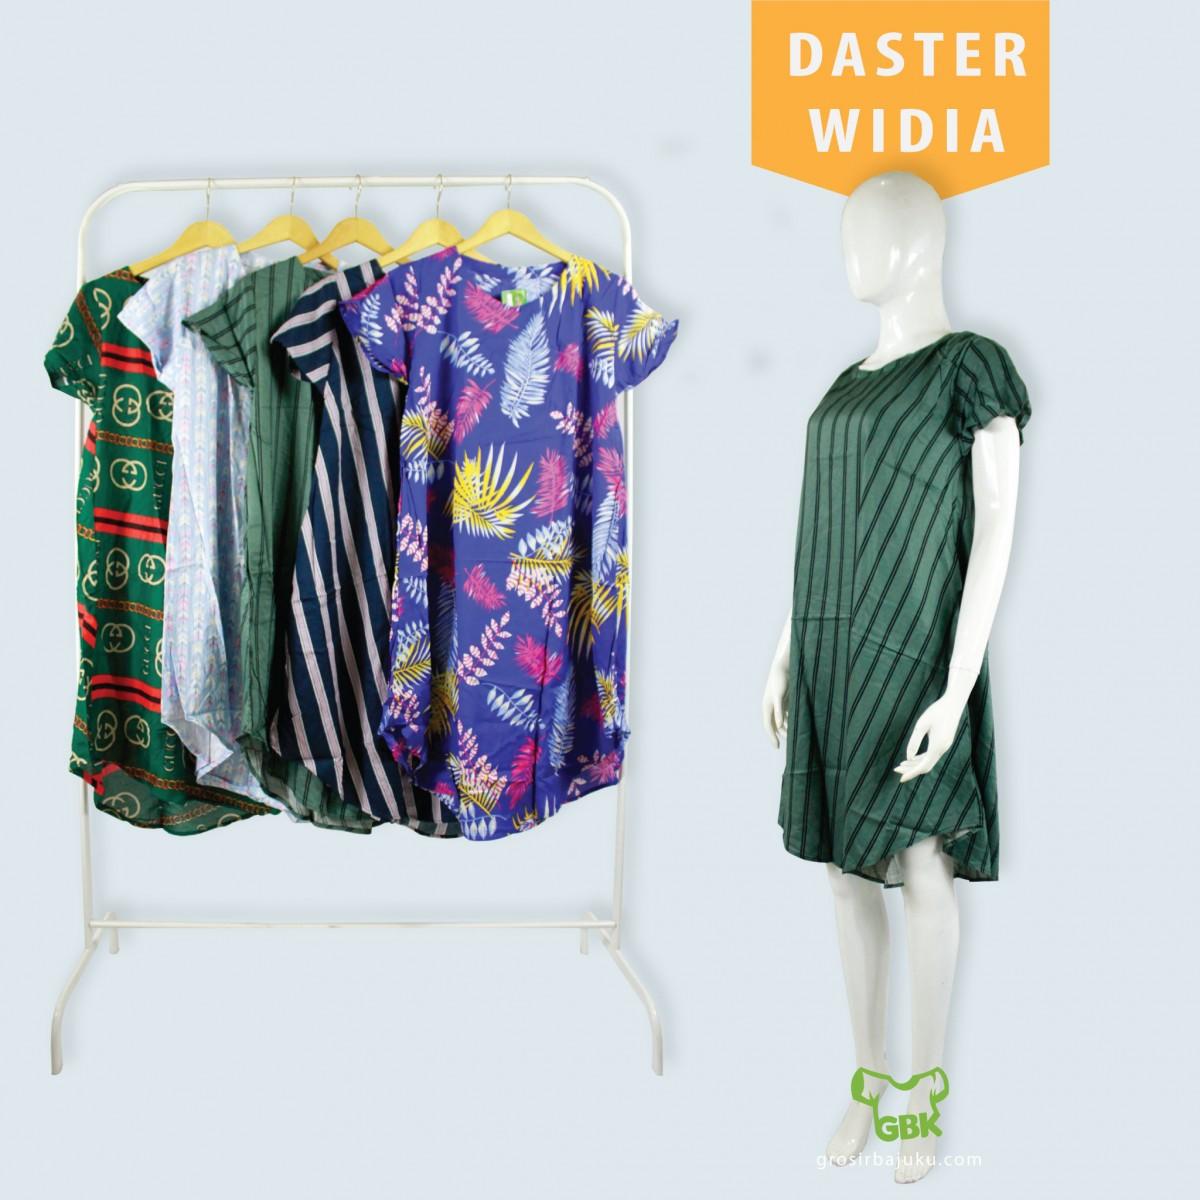 Distributor Daster Agen Daster Widia Rp 26,000